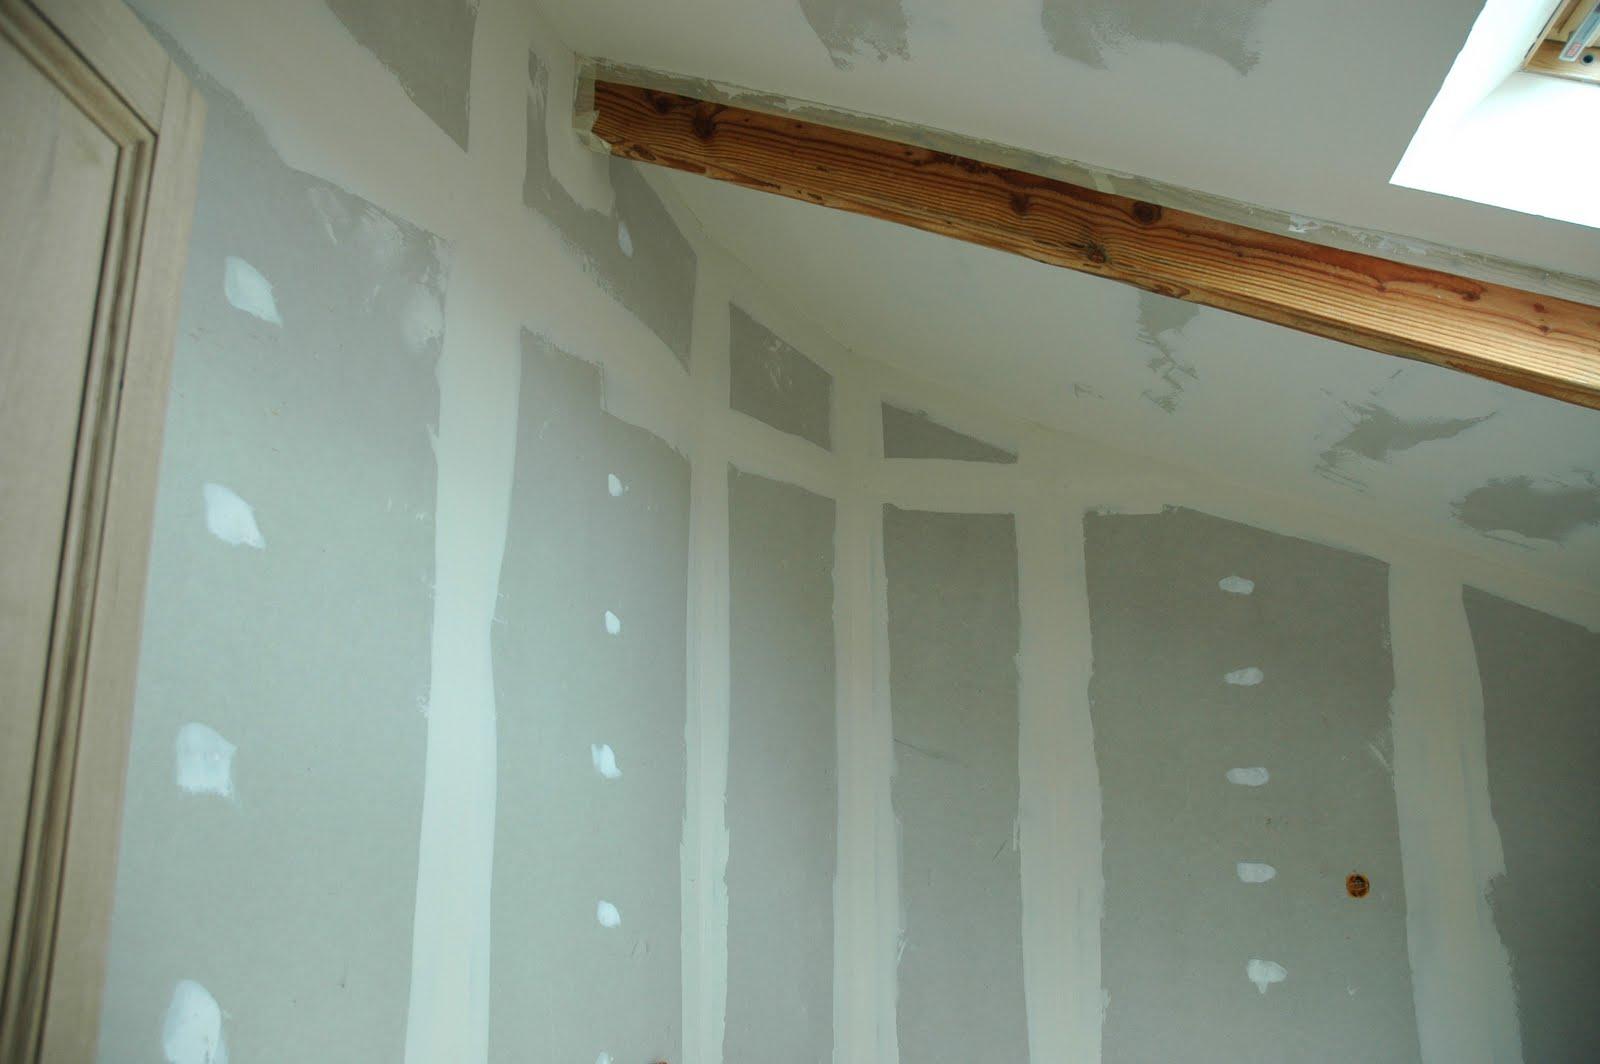 sergio d co isolation et placopl tre. Black Bedroom Furniture Sets. Home Design Ideas